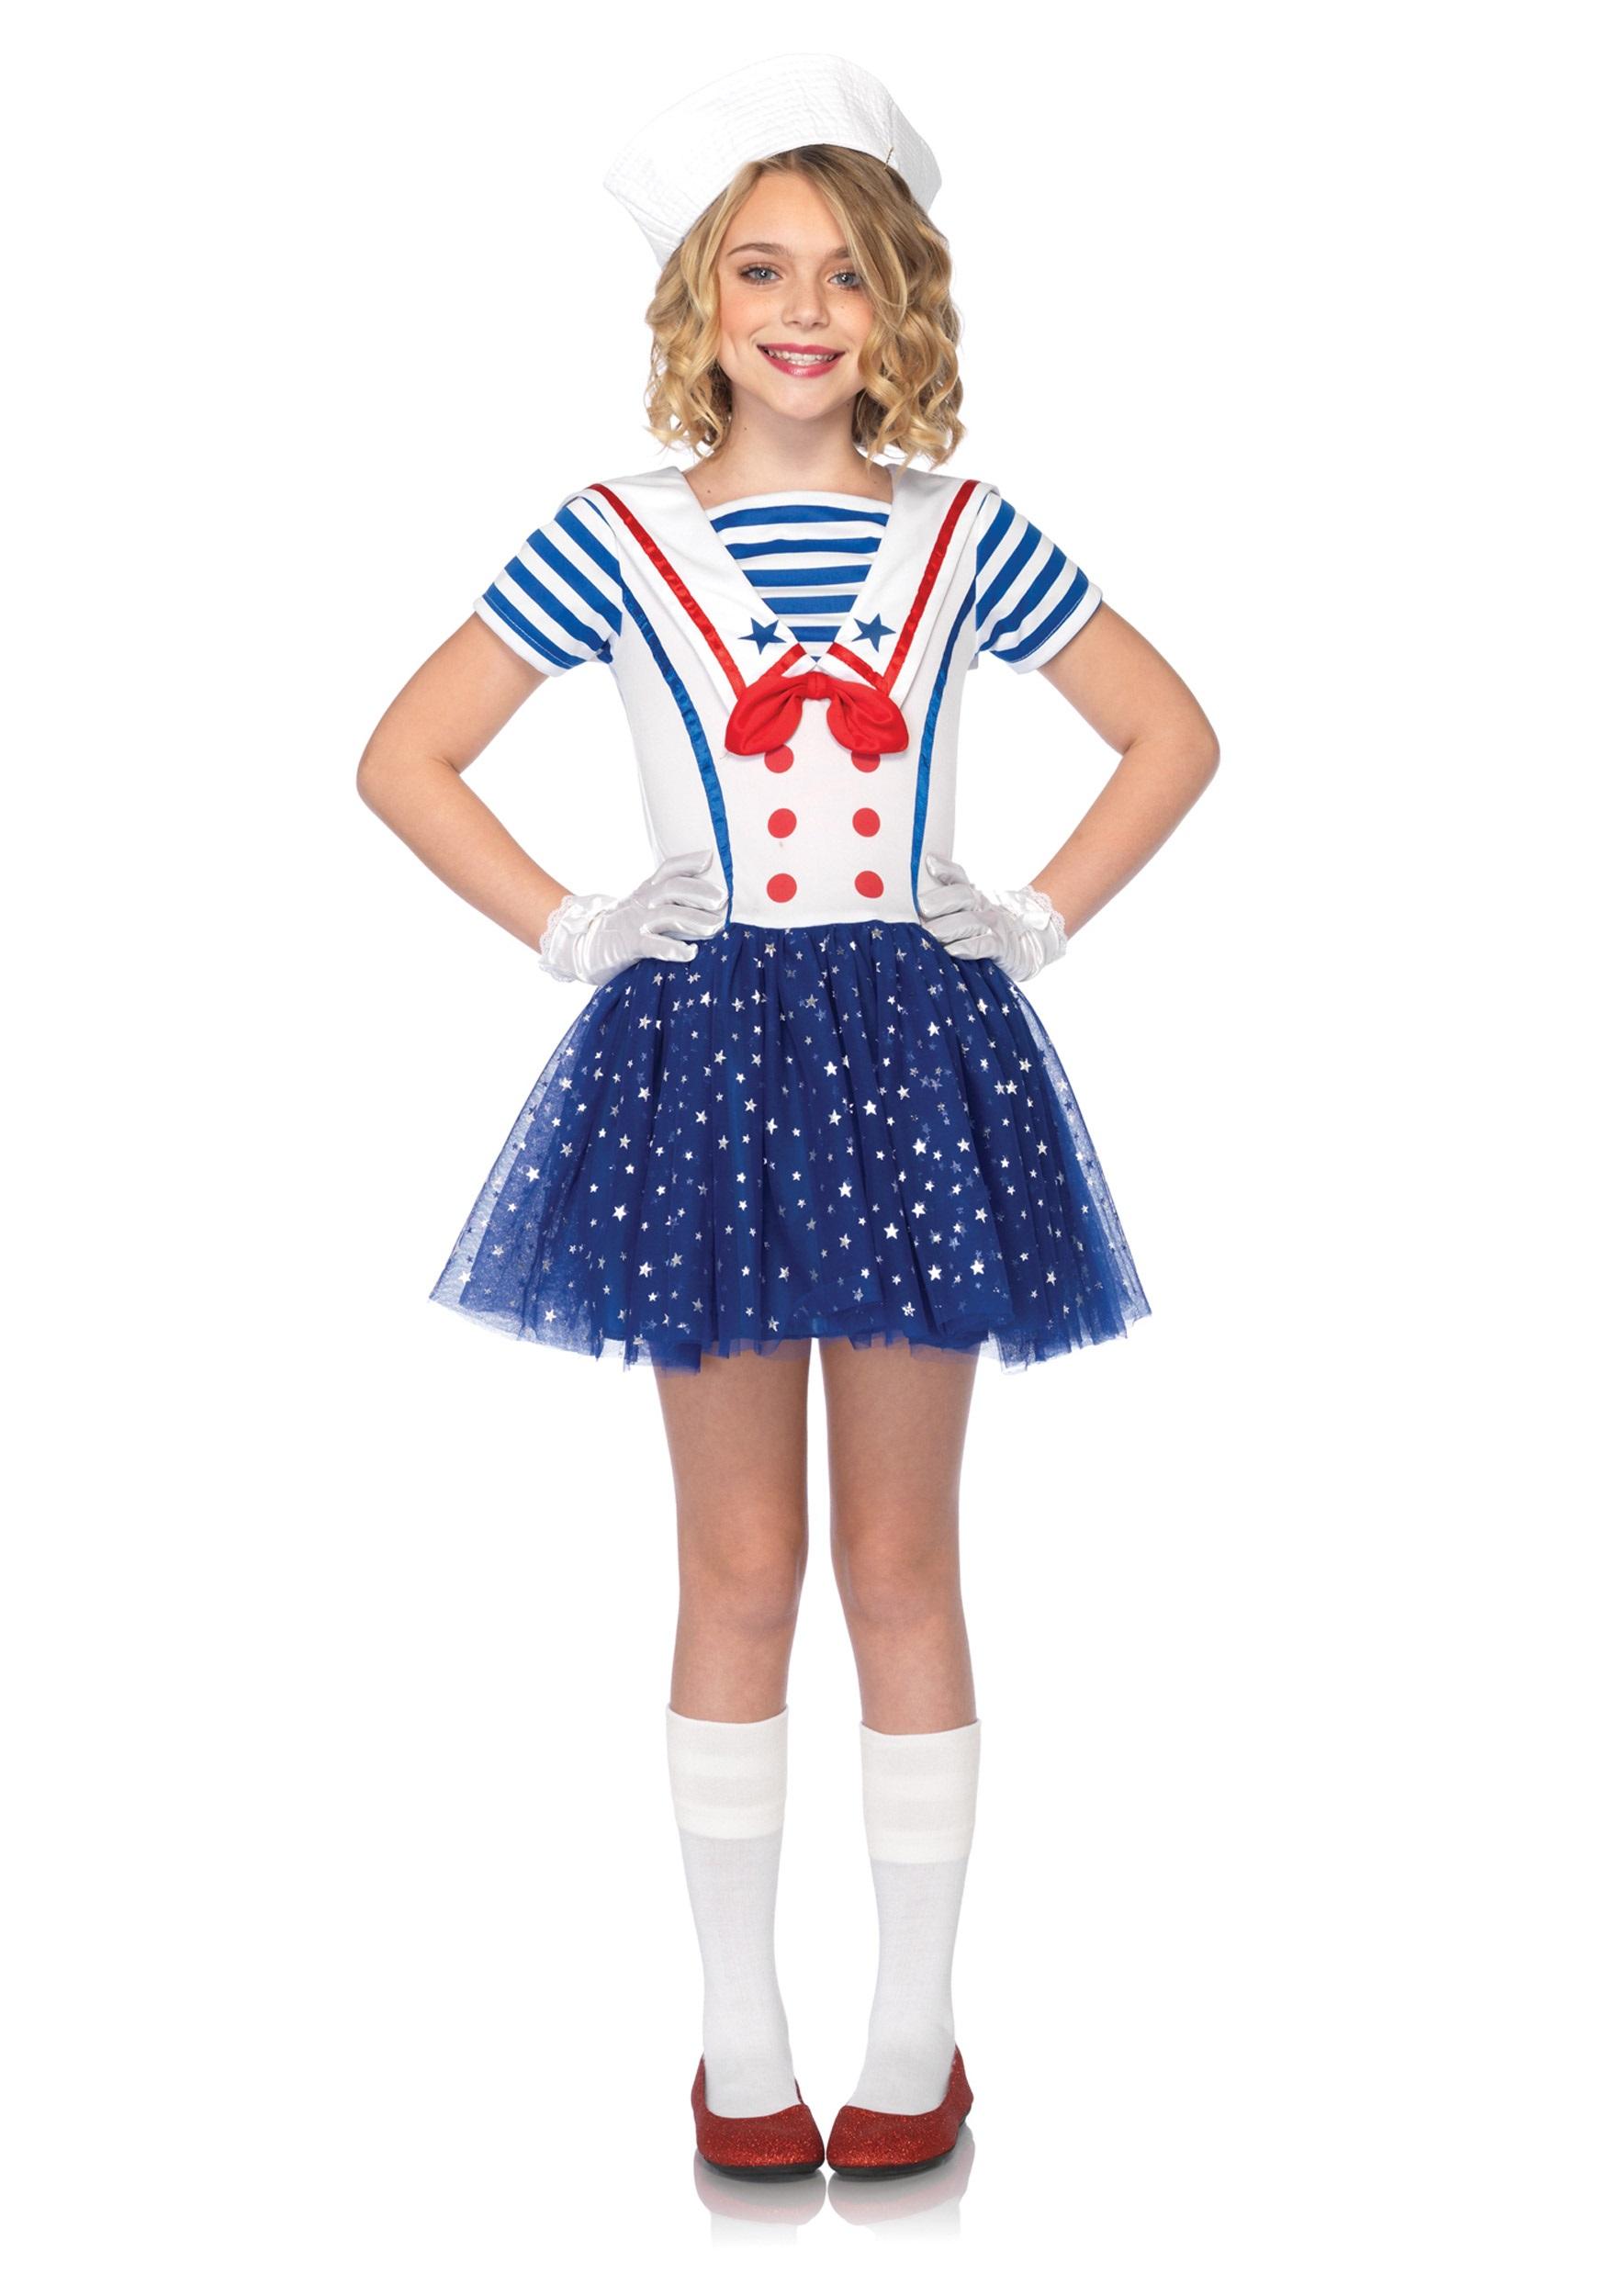 Sailor Costumes & Navy Officer Uniforms - HalloweenCostumes.com